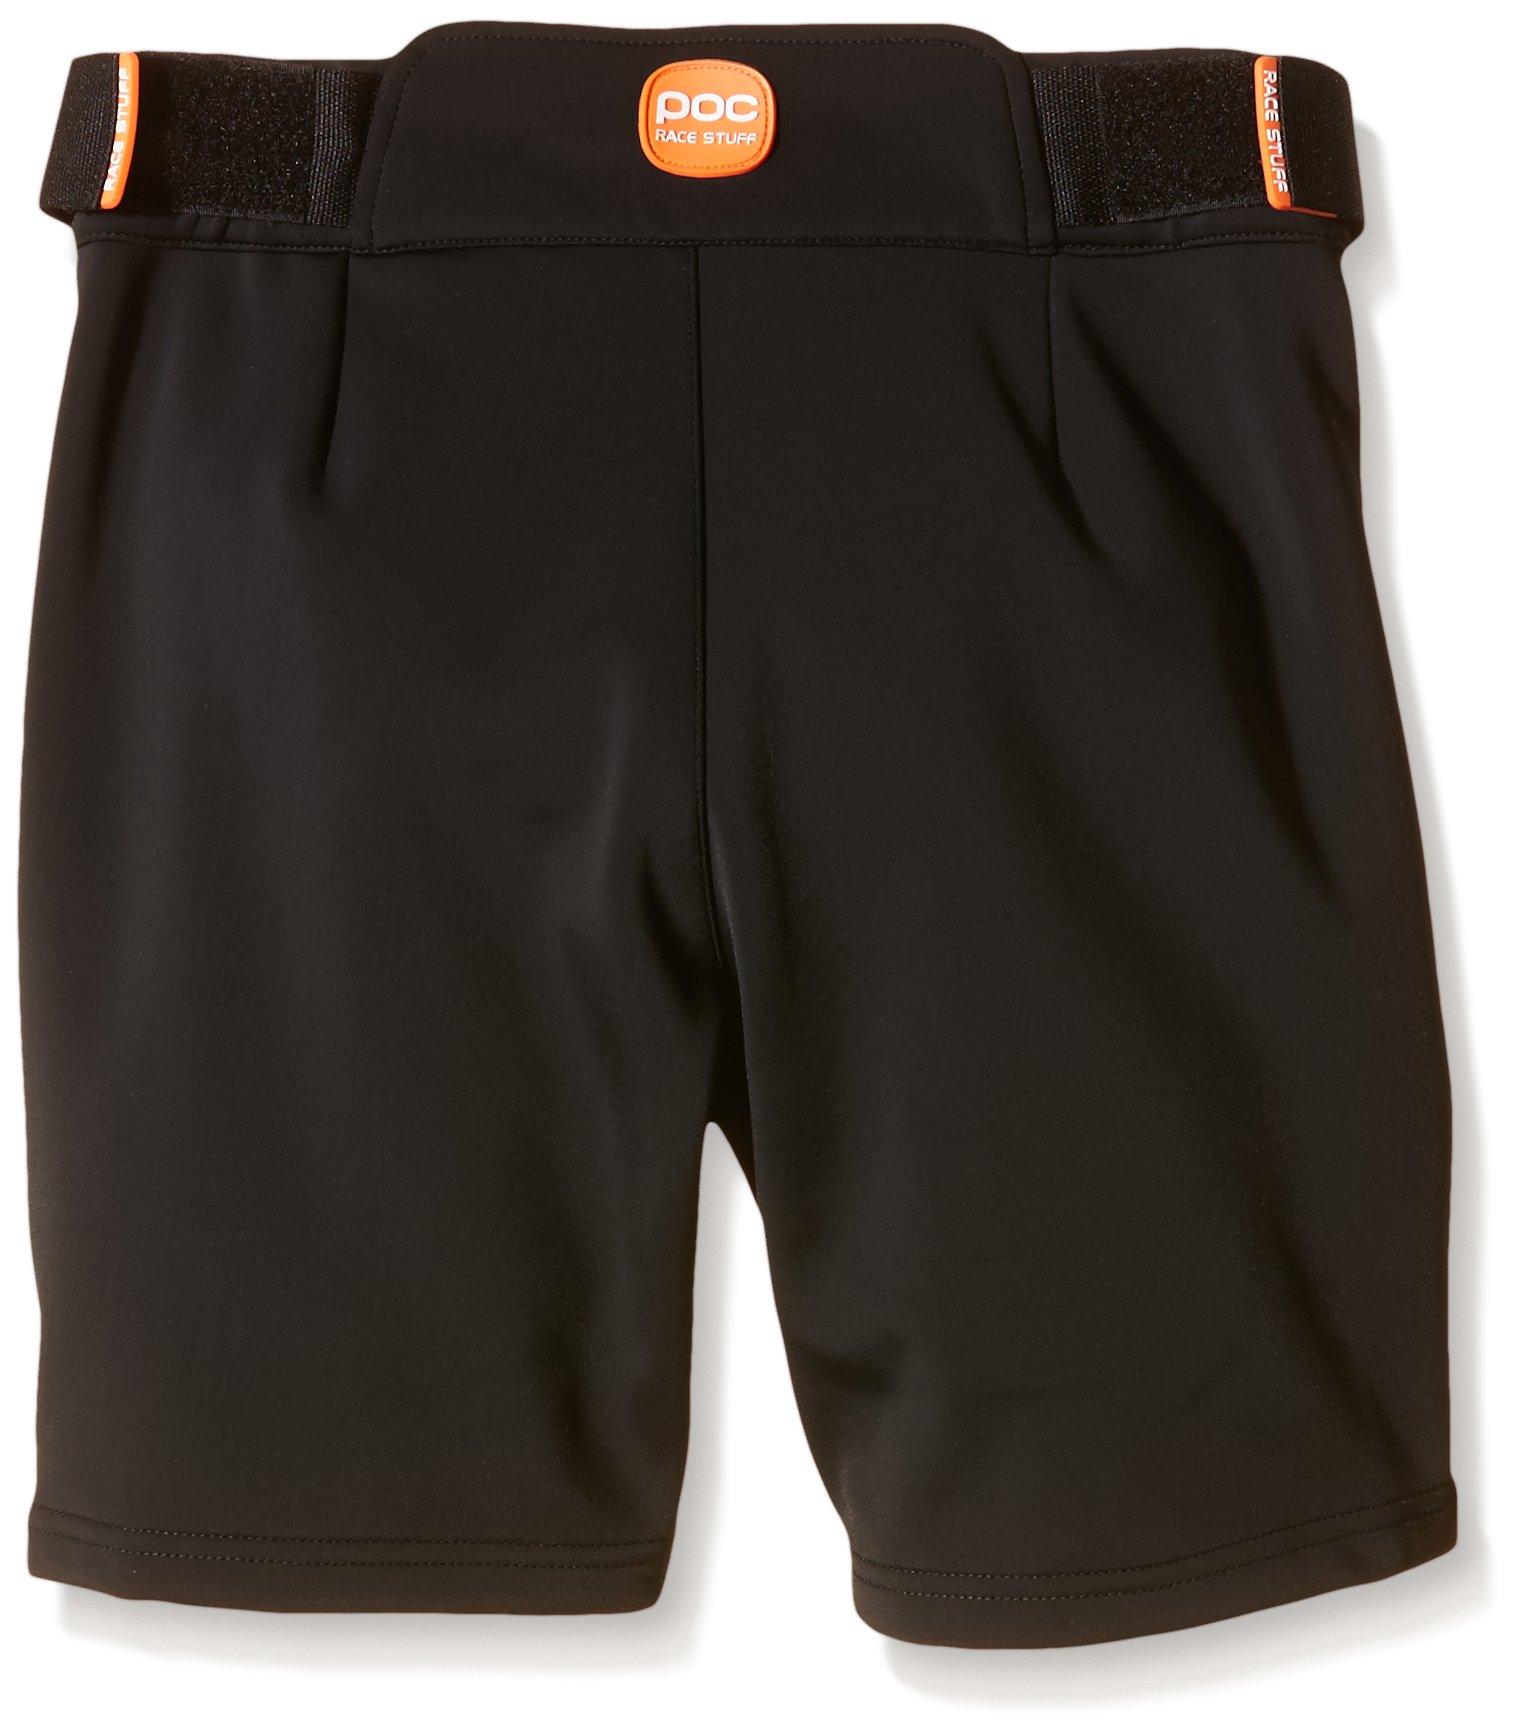 POC Junior Race Skiing Shorts, Uranium Black, Size 140/10